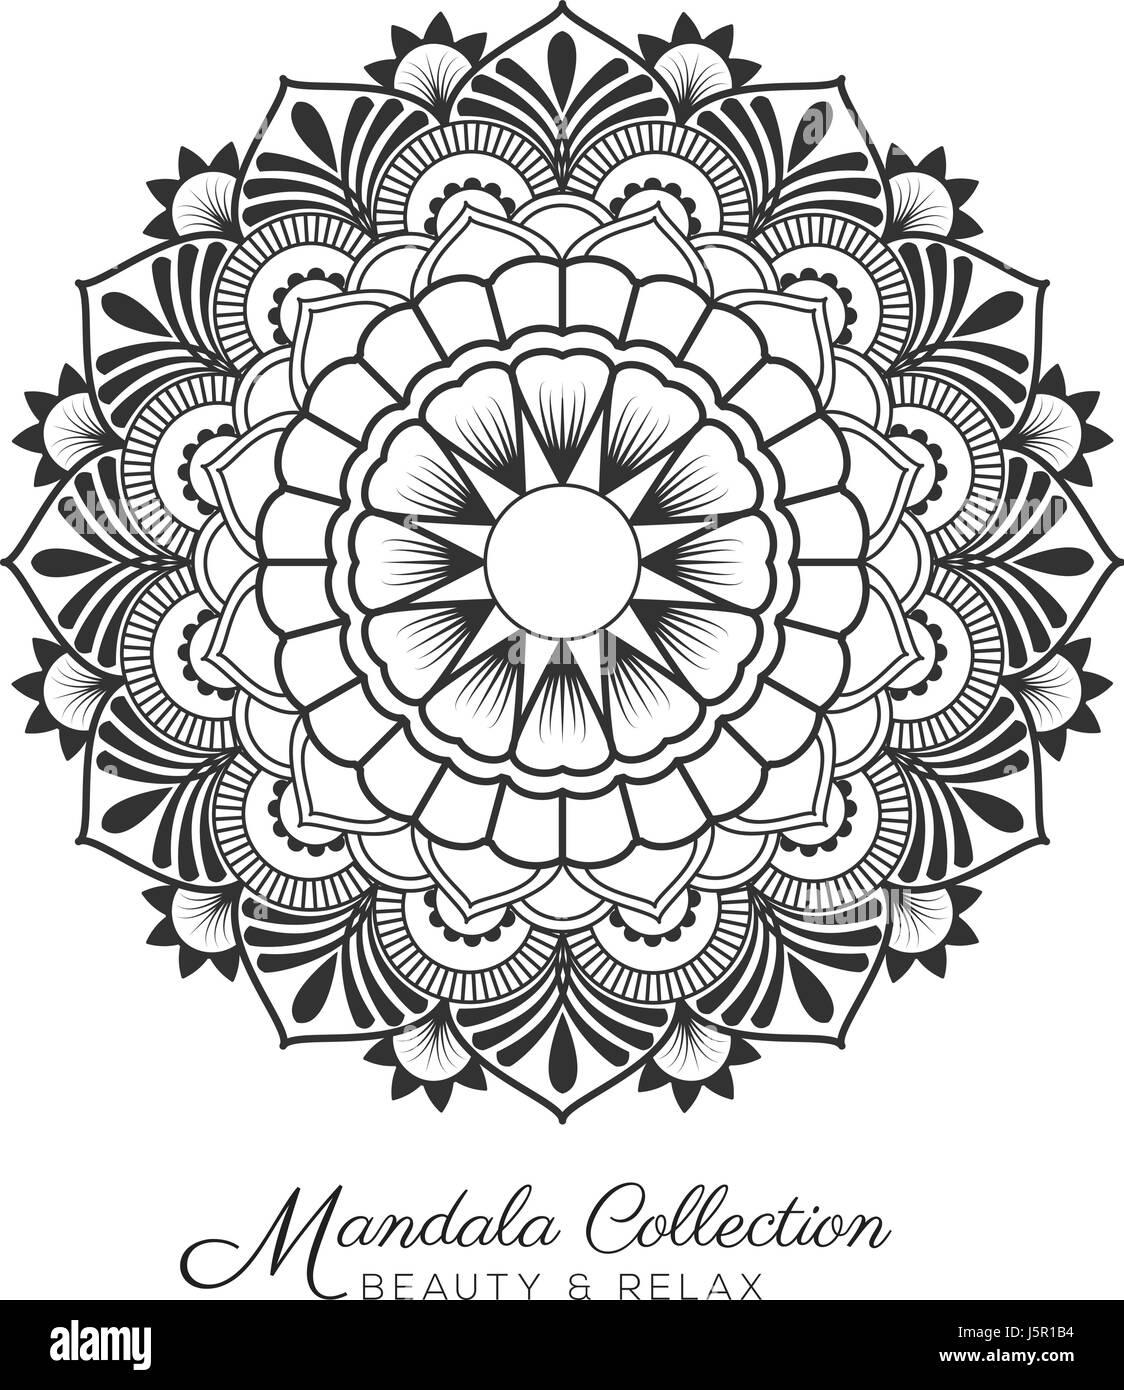 Tibetan Mandala Decorative Ornament Design For Coloring Page Greeting Card Invitation Tattoo Yoga And Spa Symbol Vector Illustration